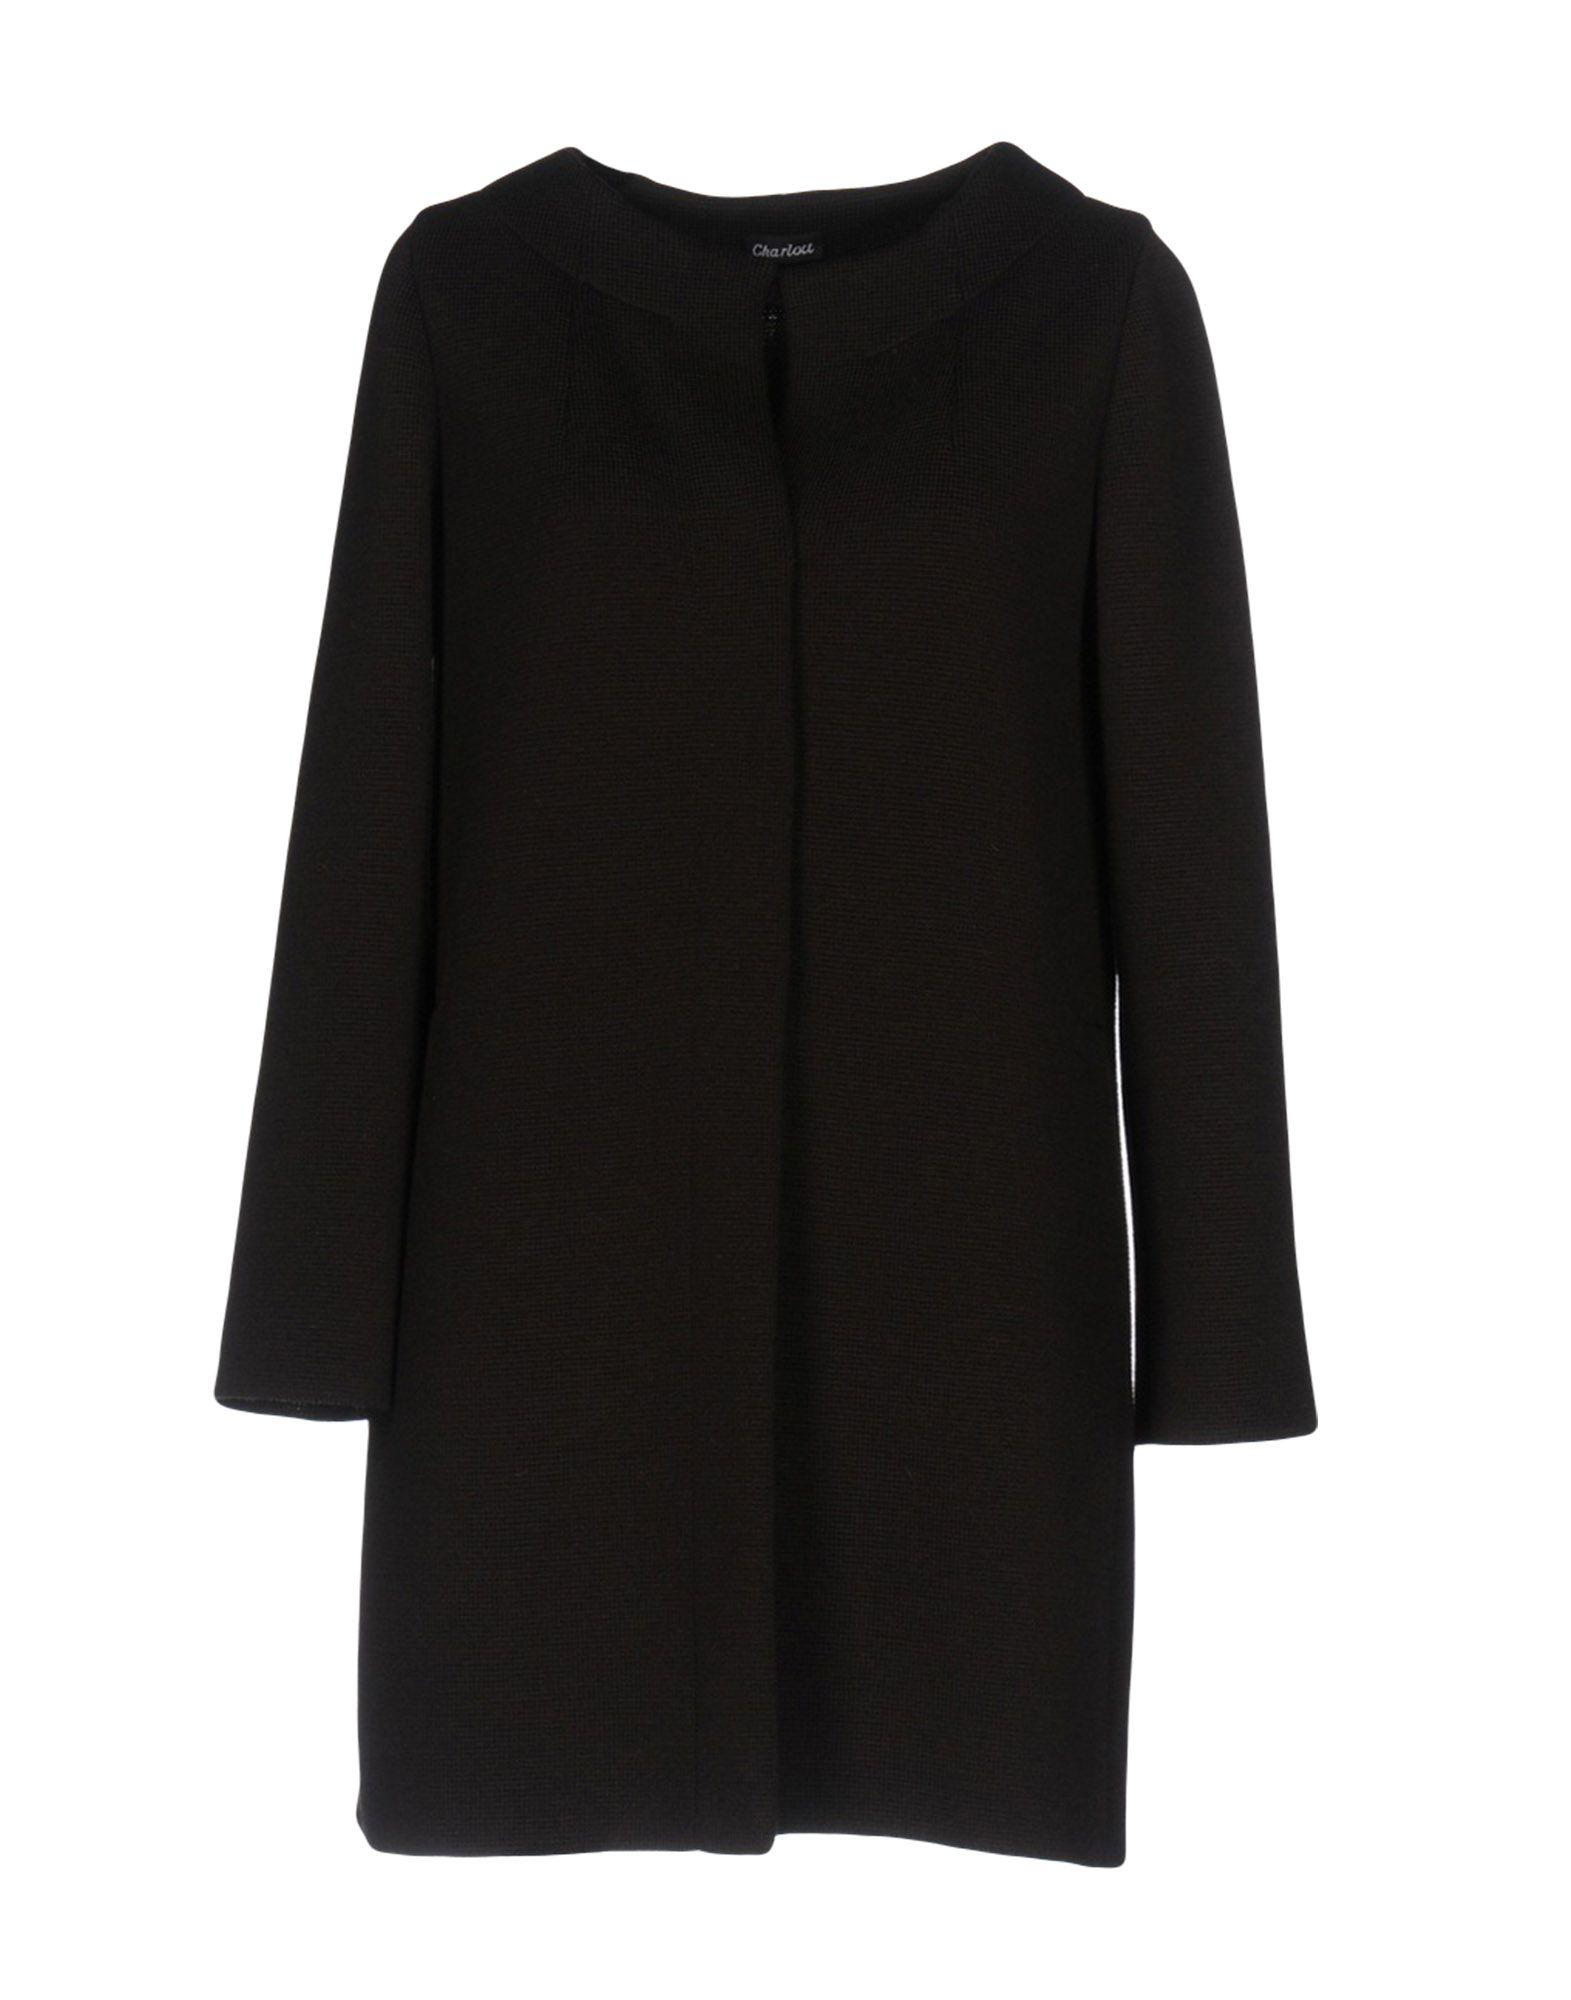 Charlott Coats In Dark Brown